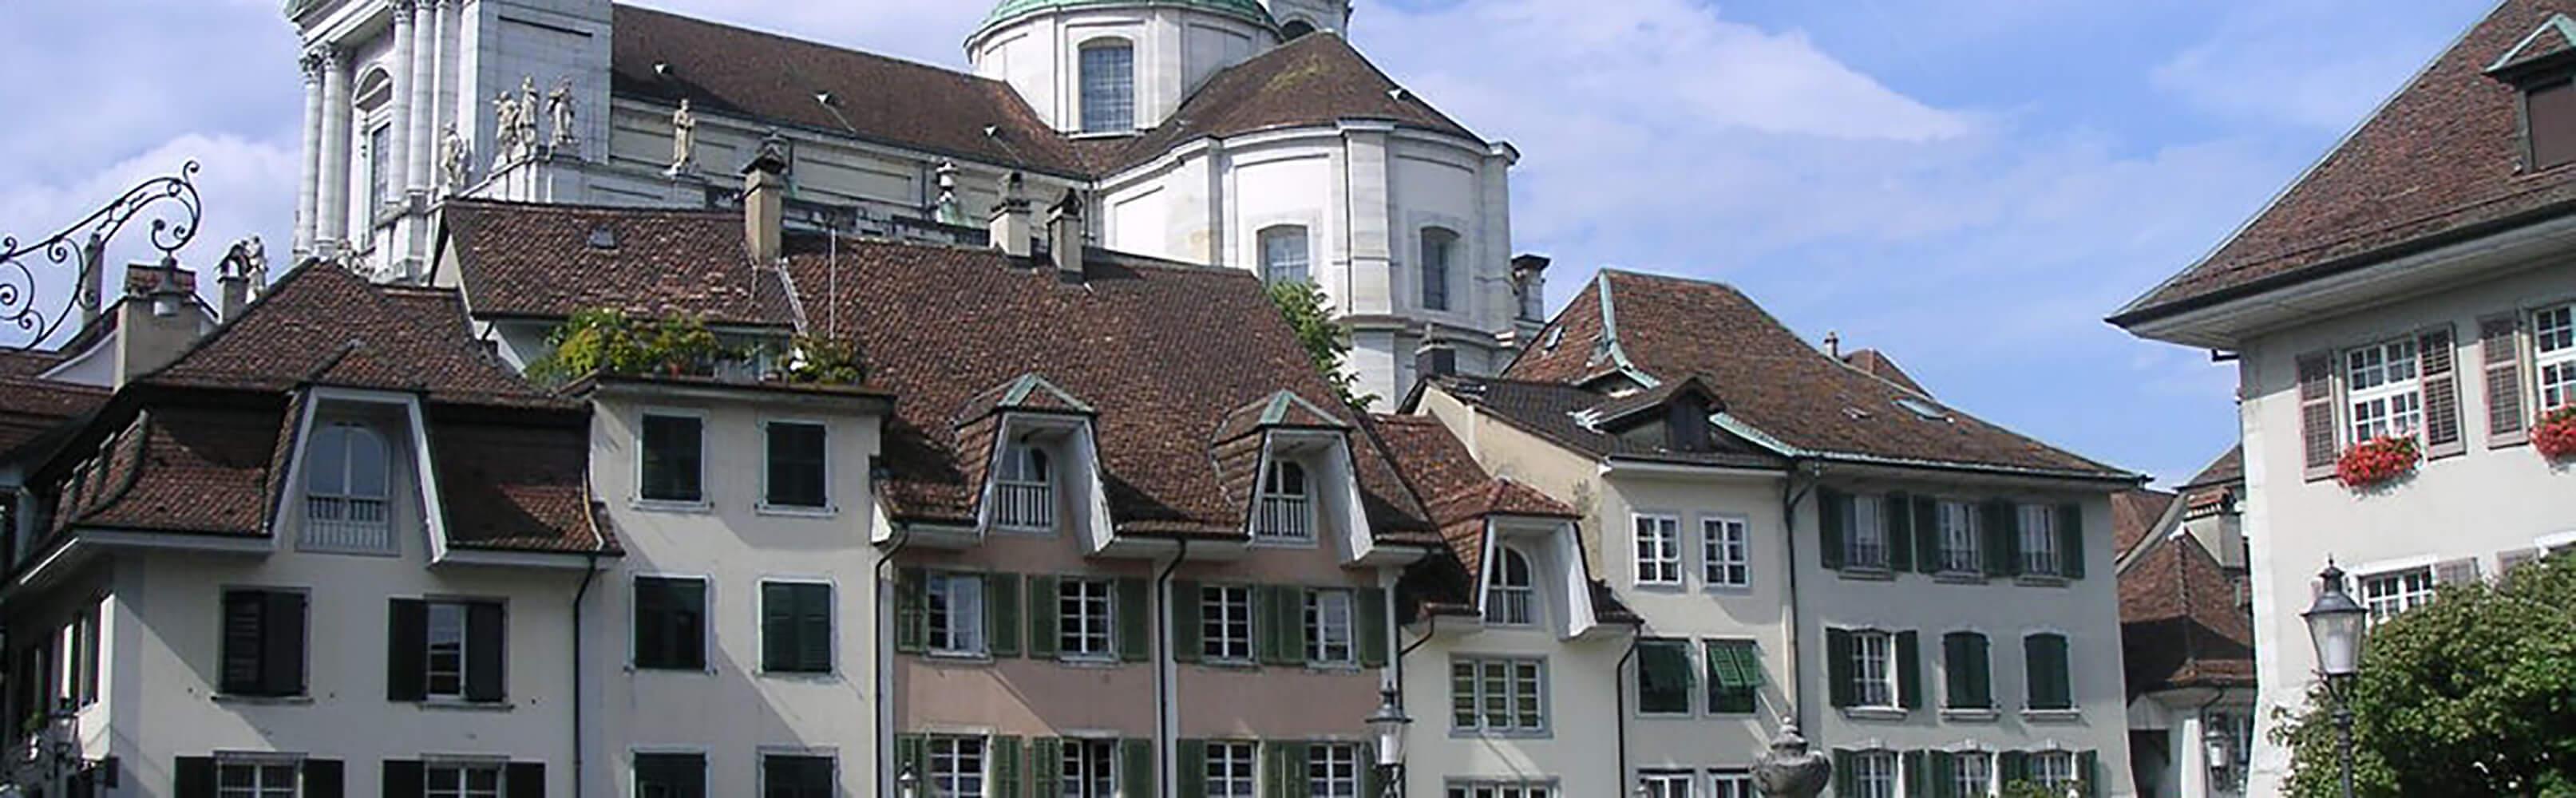 Hist. Altstadt / St. Ursenkathedrale 1